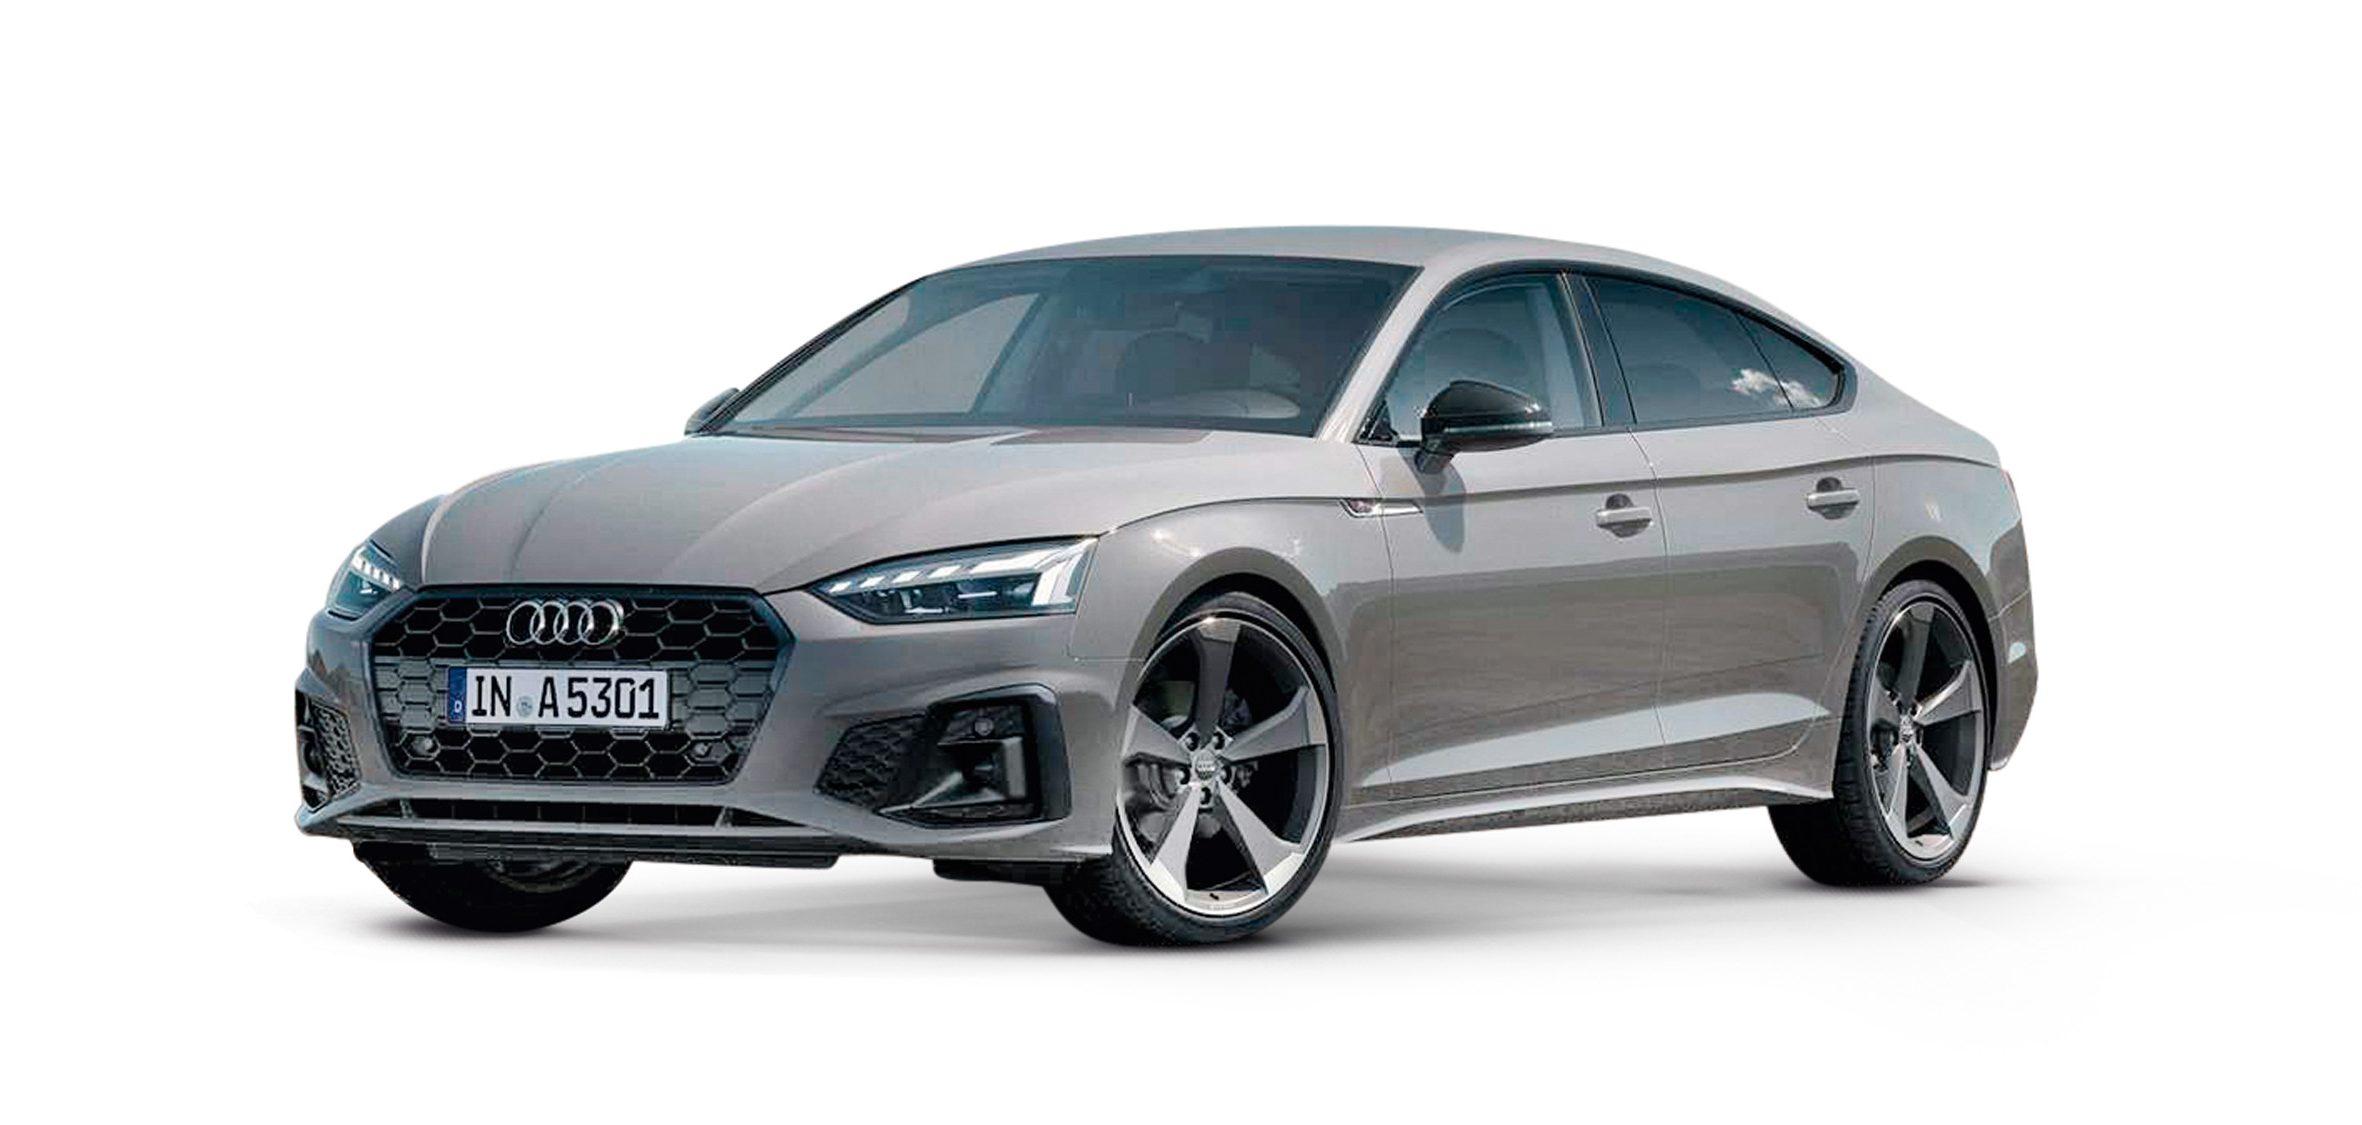 Audi A5 Sportback 2.0 Prestige P.